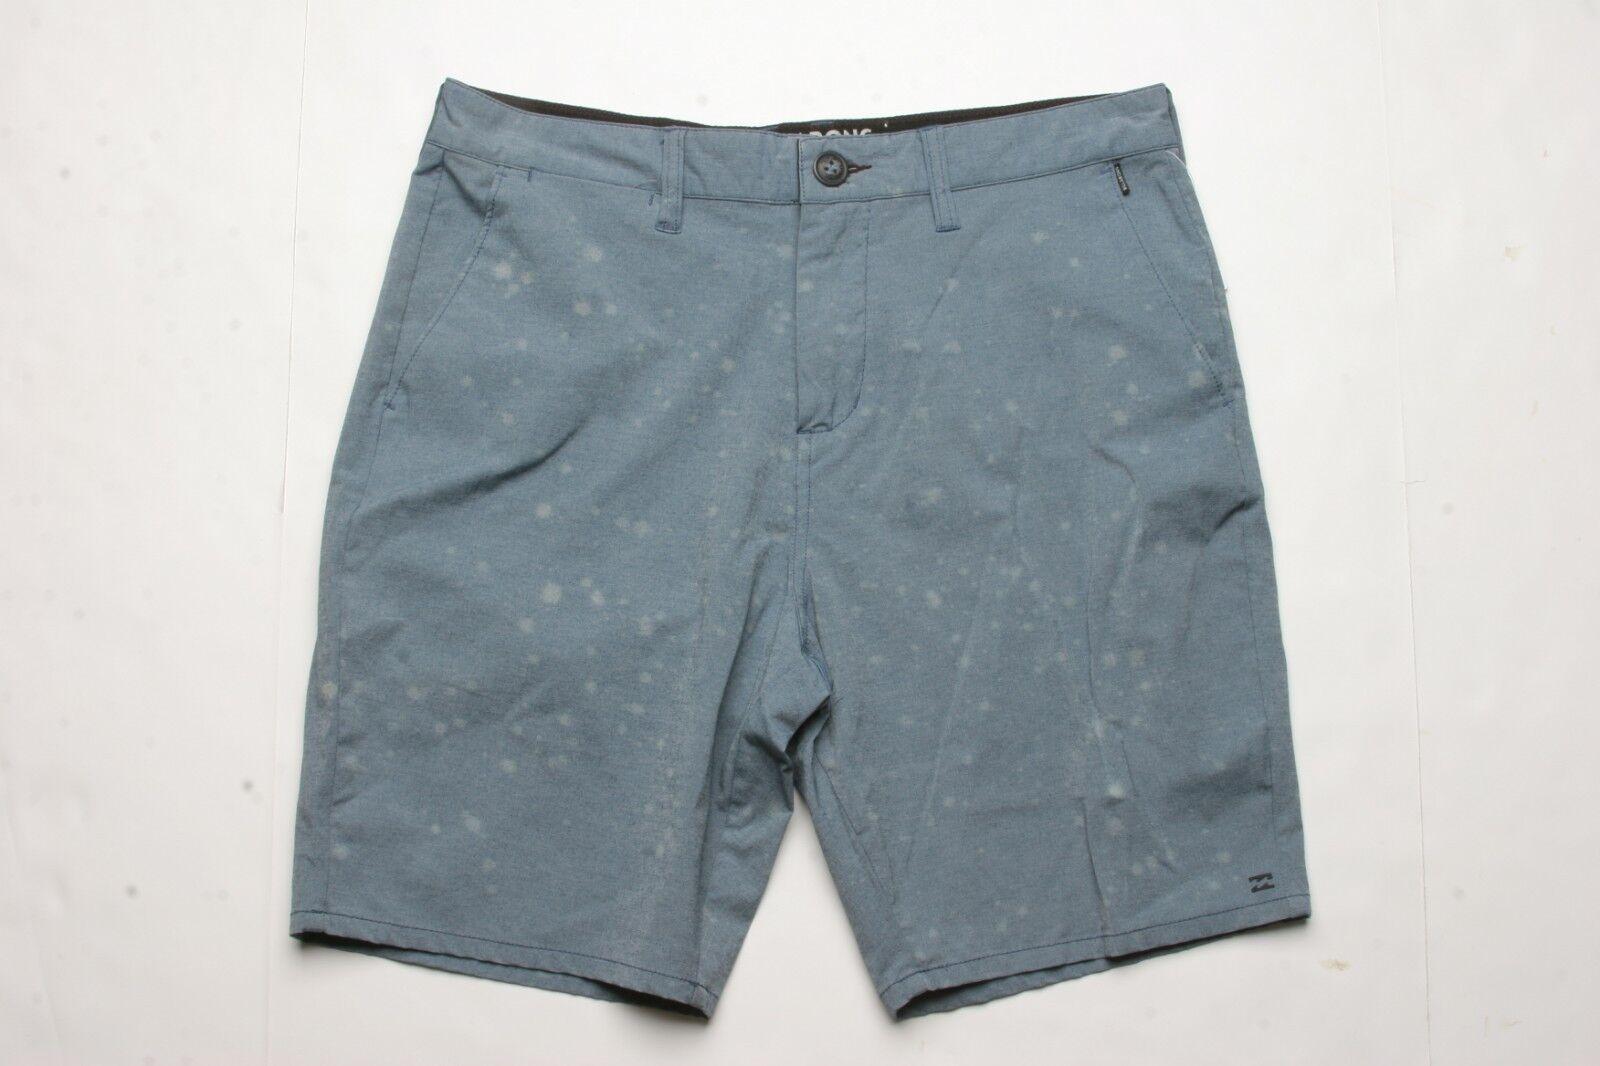 Billabong New Order Short (32) Slate bluee